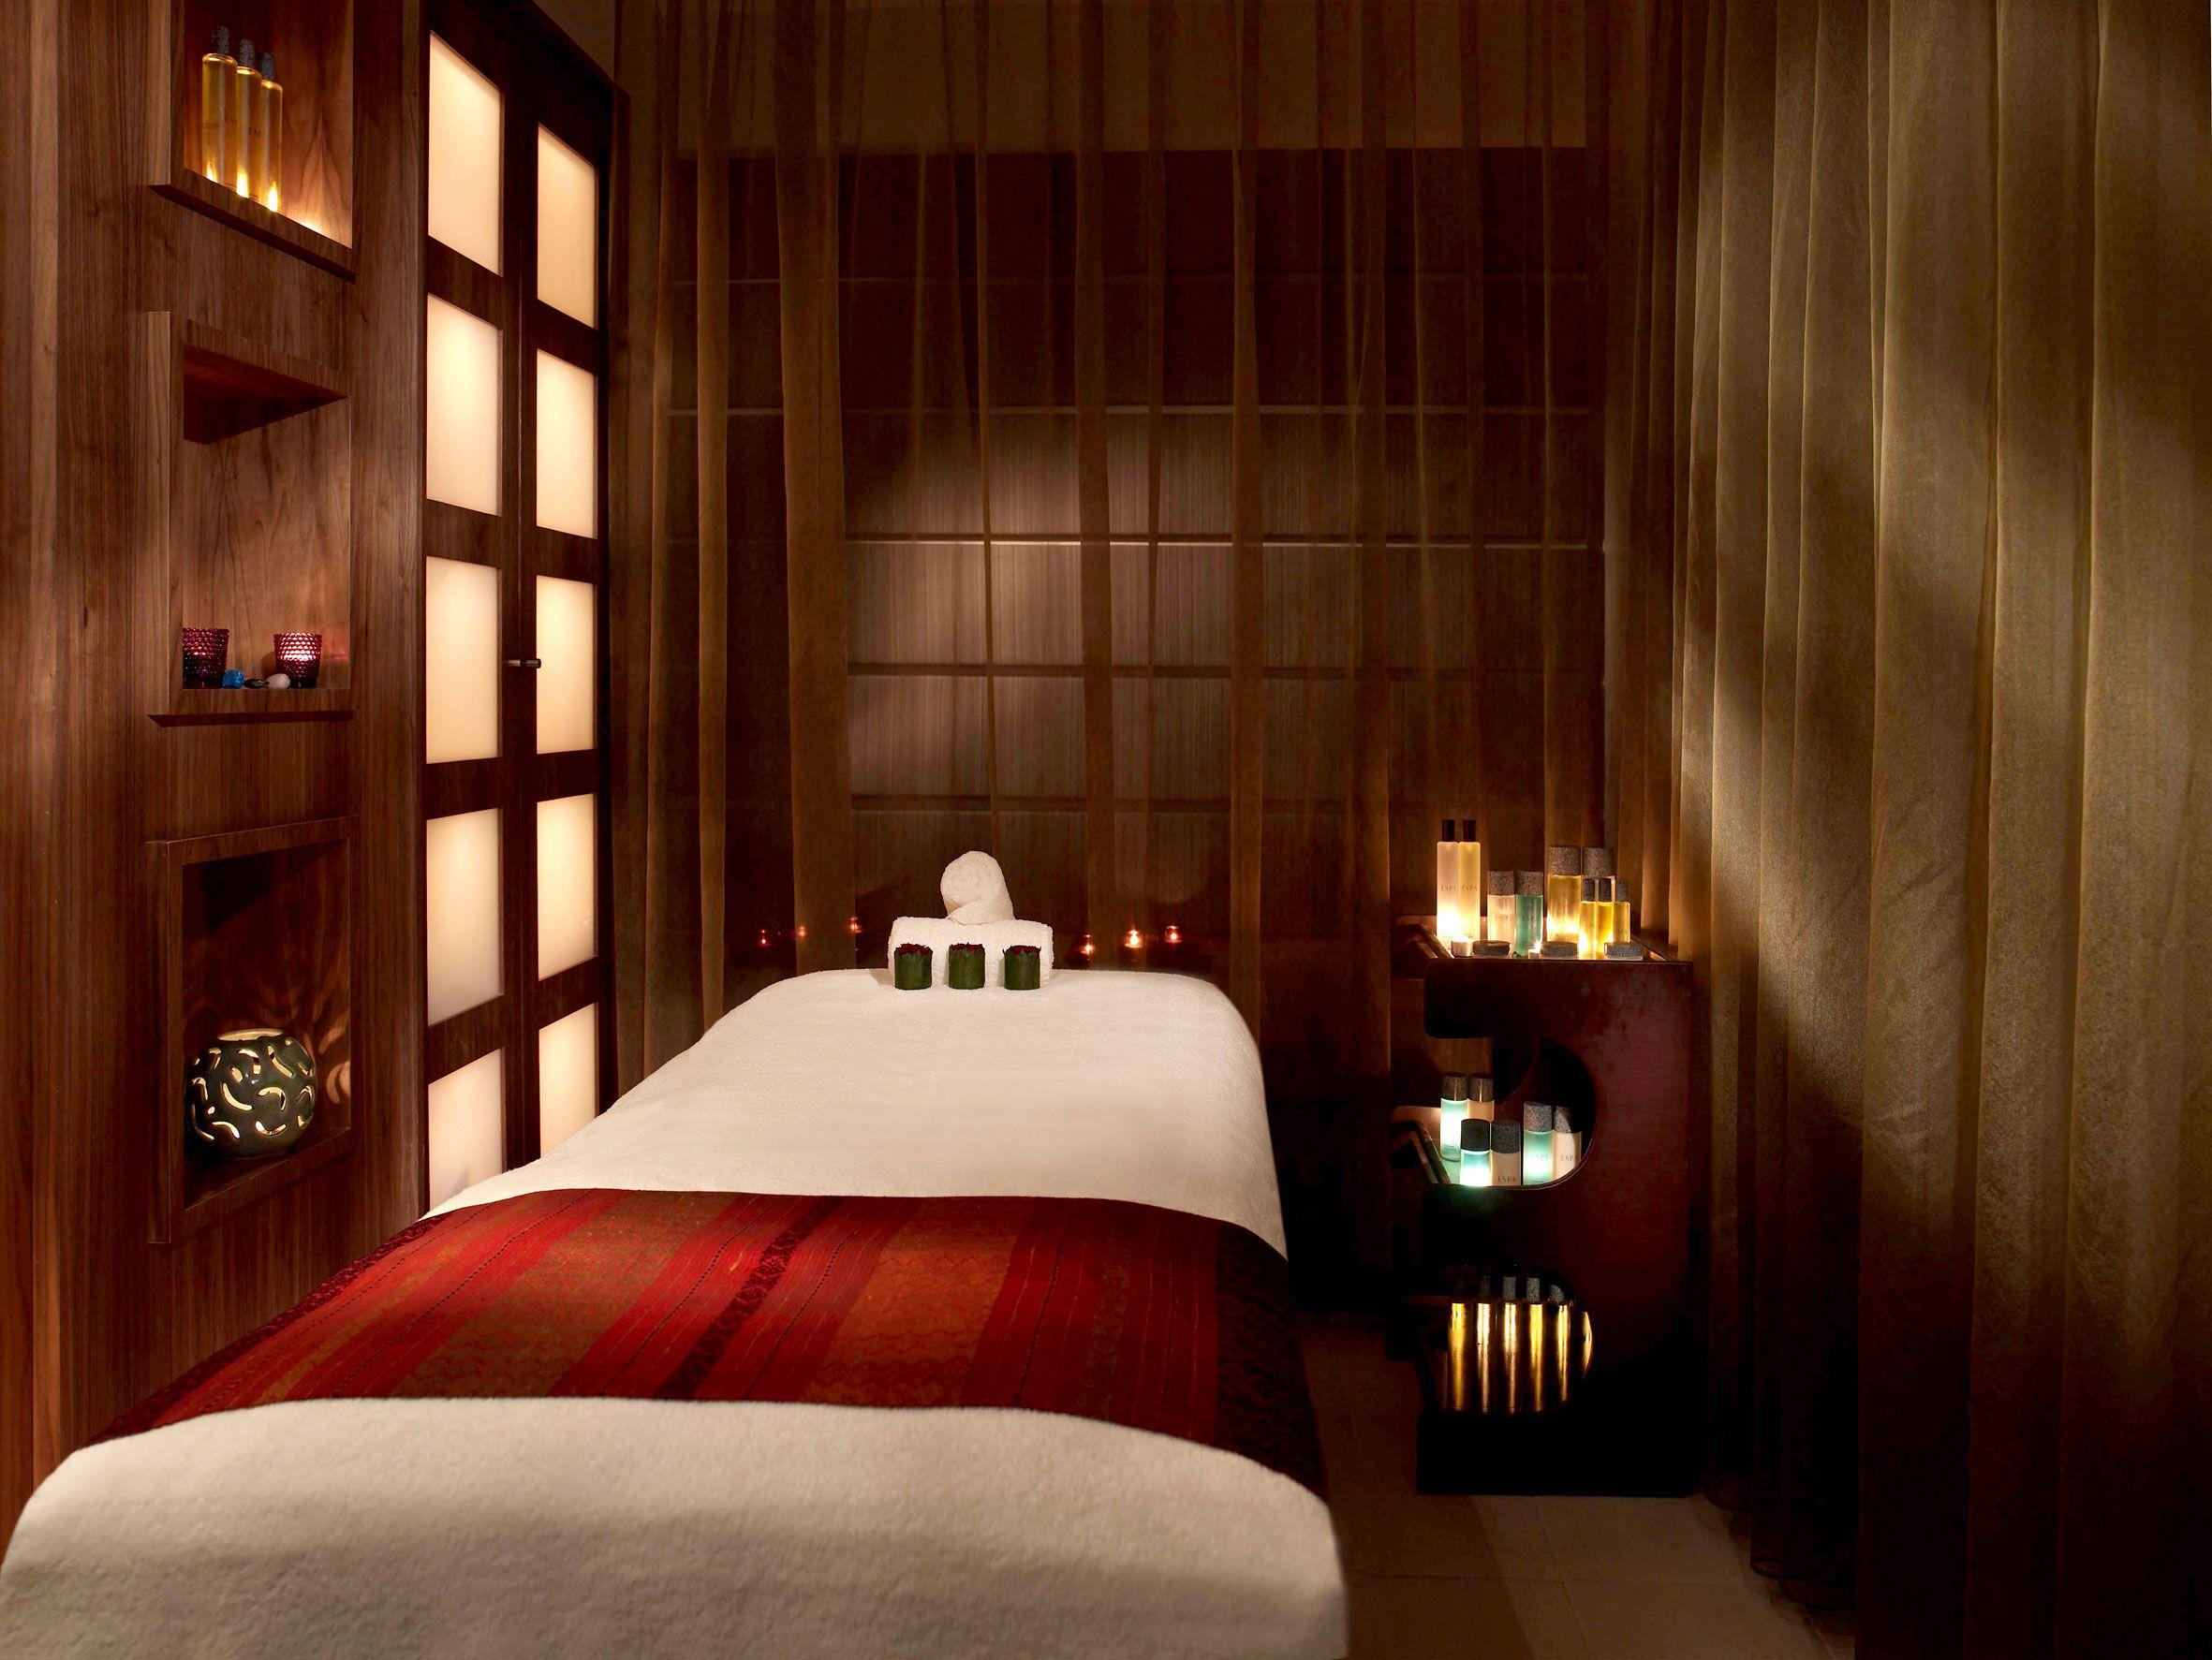 Massage Therapy Room Design Ideas Part - 44: Spa Rooms | Landmark Spa U0026 Health Club Spa Treatment Room At A Hotel Spa In  · Massage Therapy RoomsMassage Room DesignMassage Room DecorSpa ...